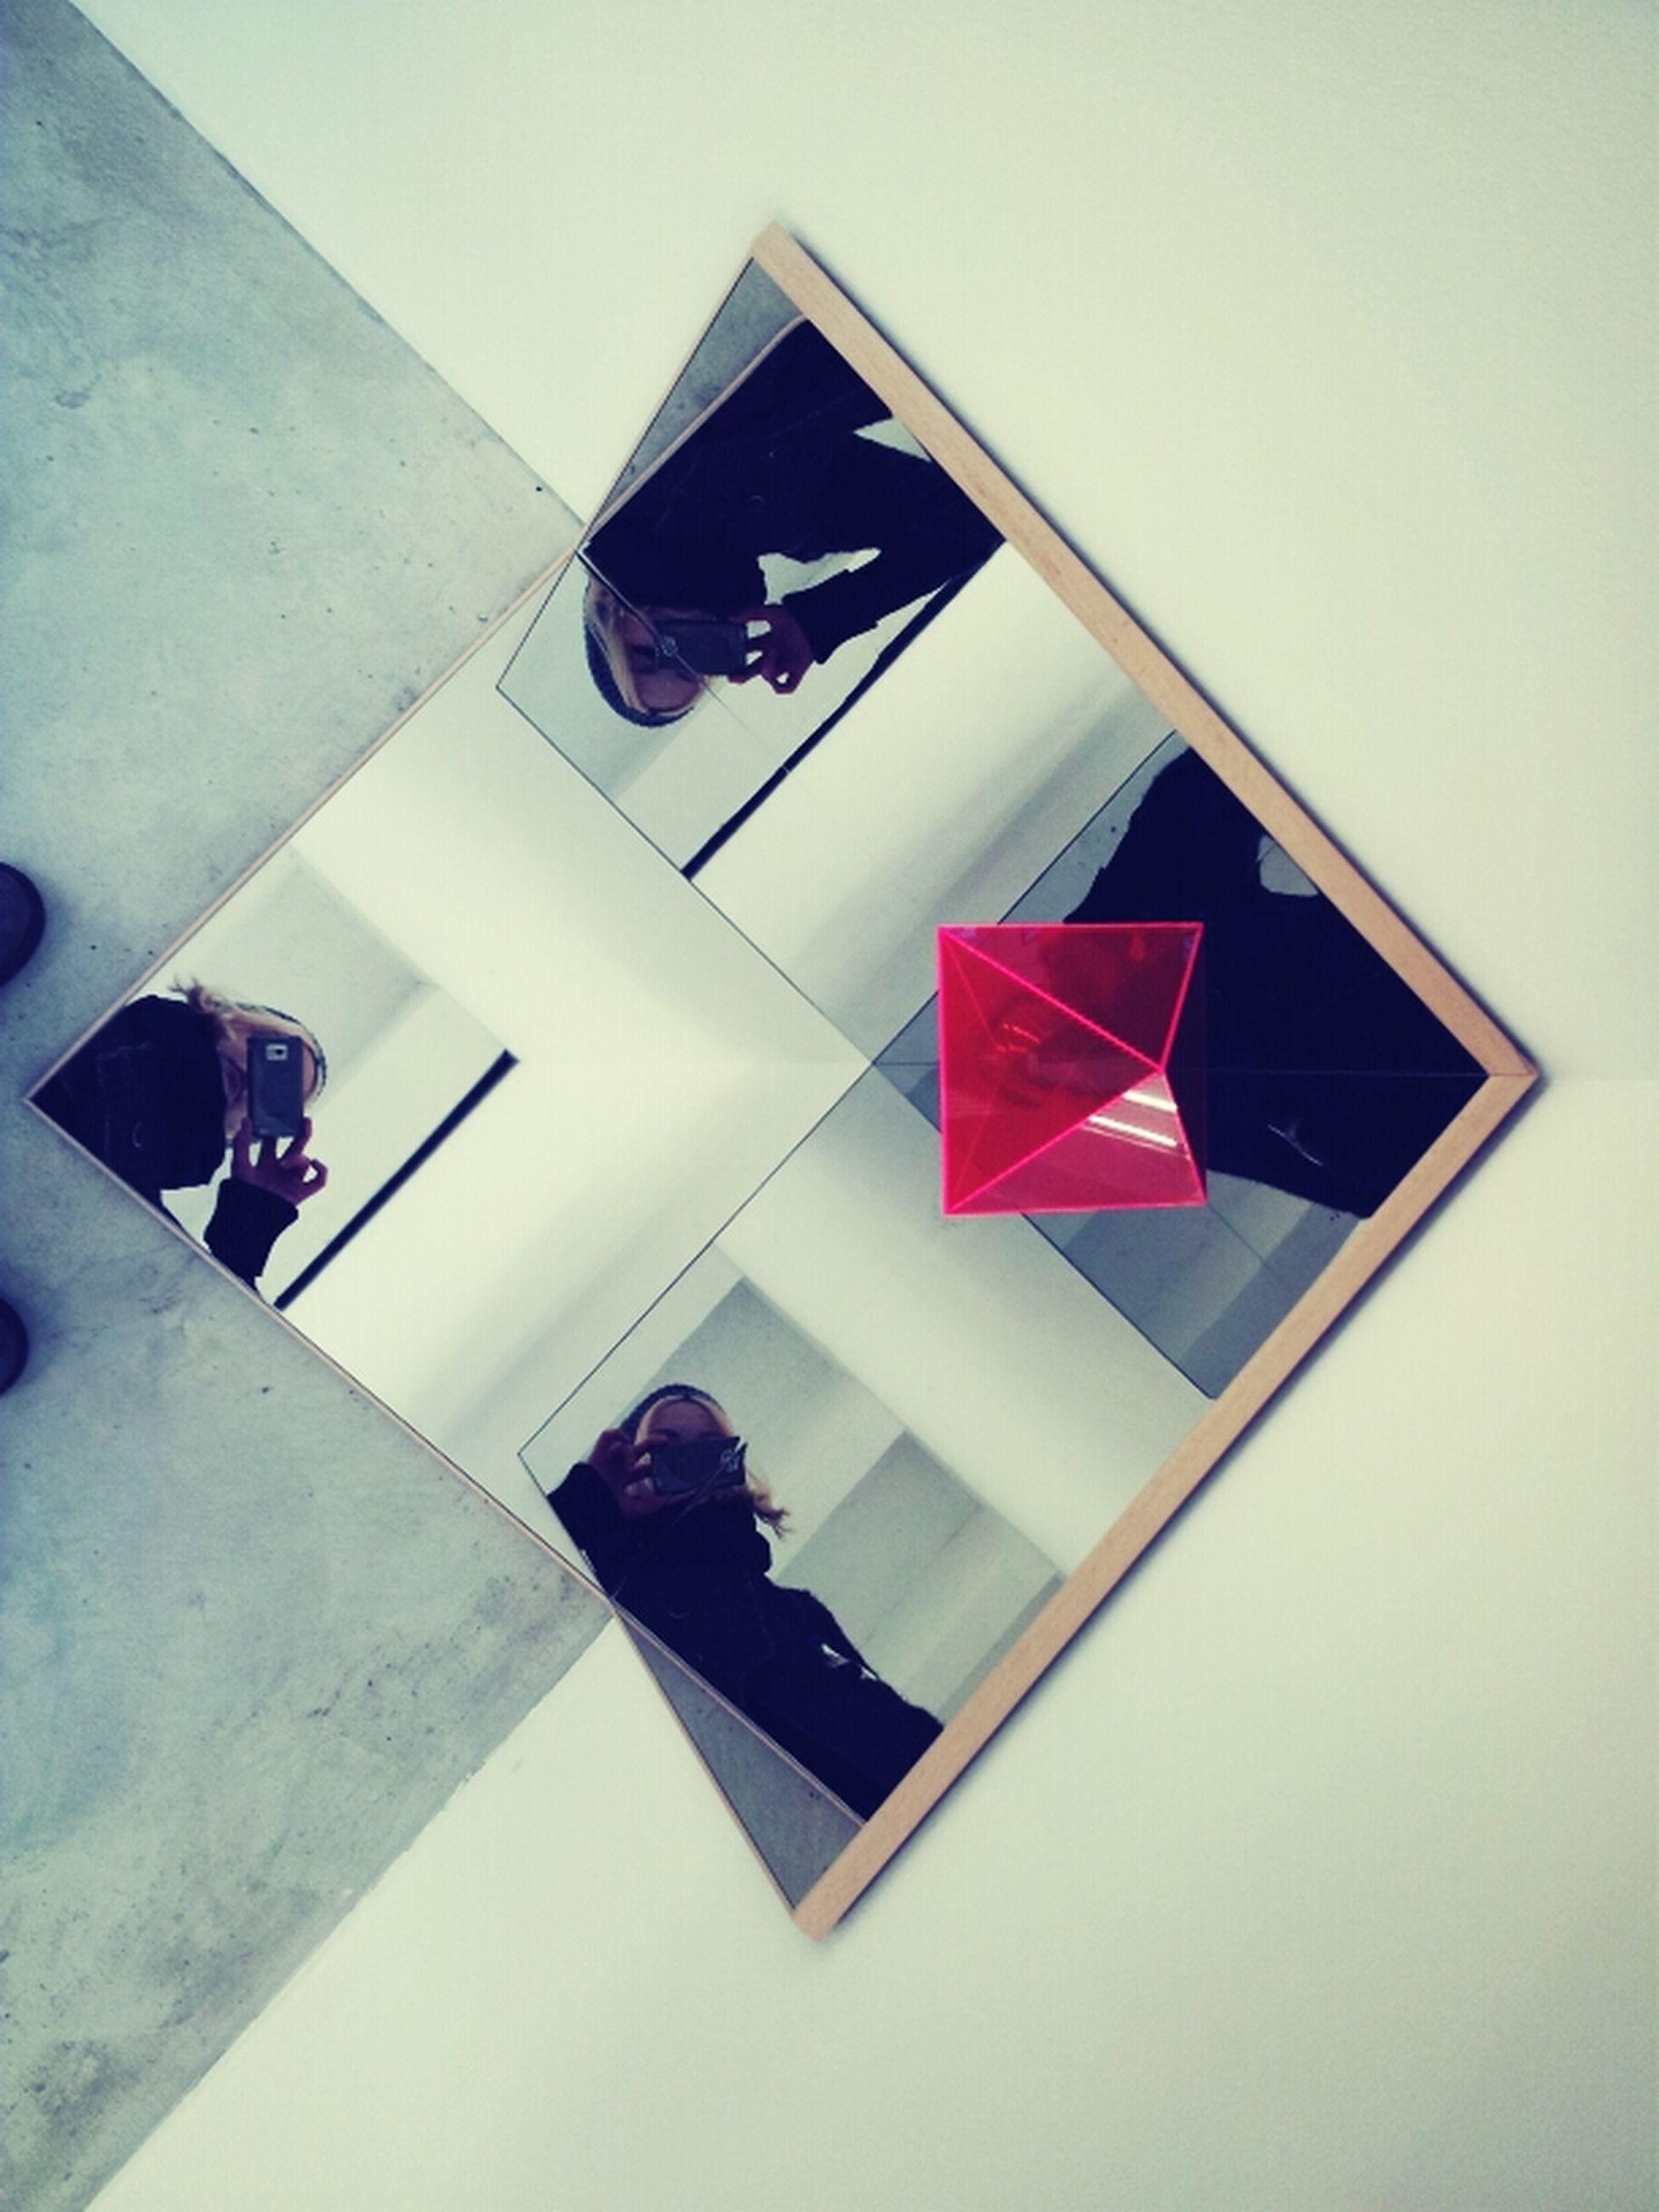 Art Mirror Pyramid Optical Illusion Hreinn Friðfinnsson Plexiglas